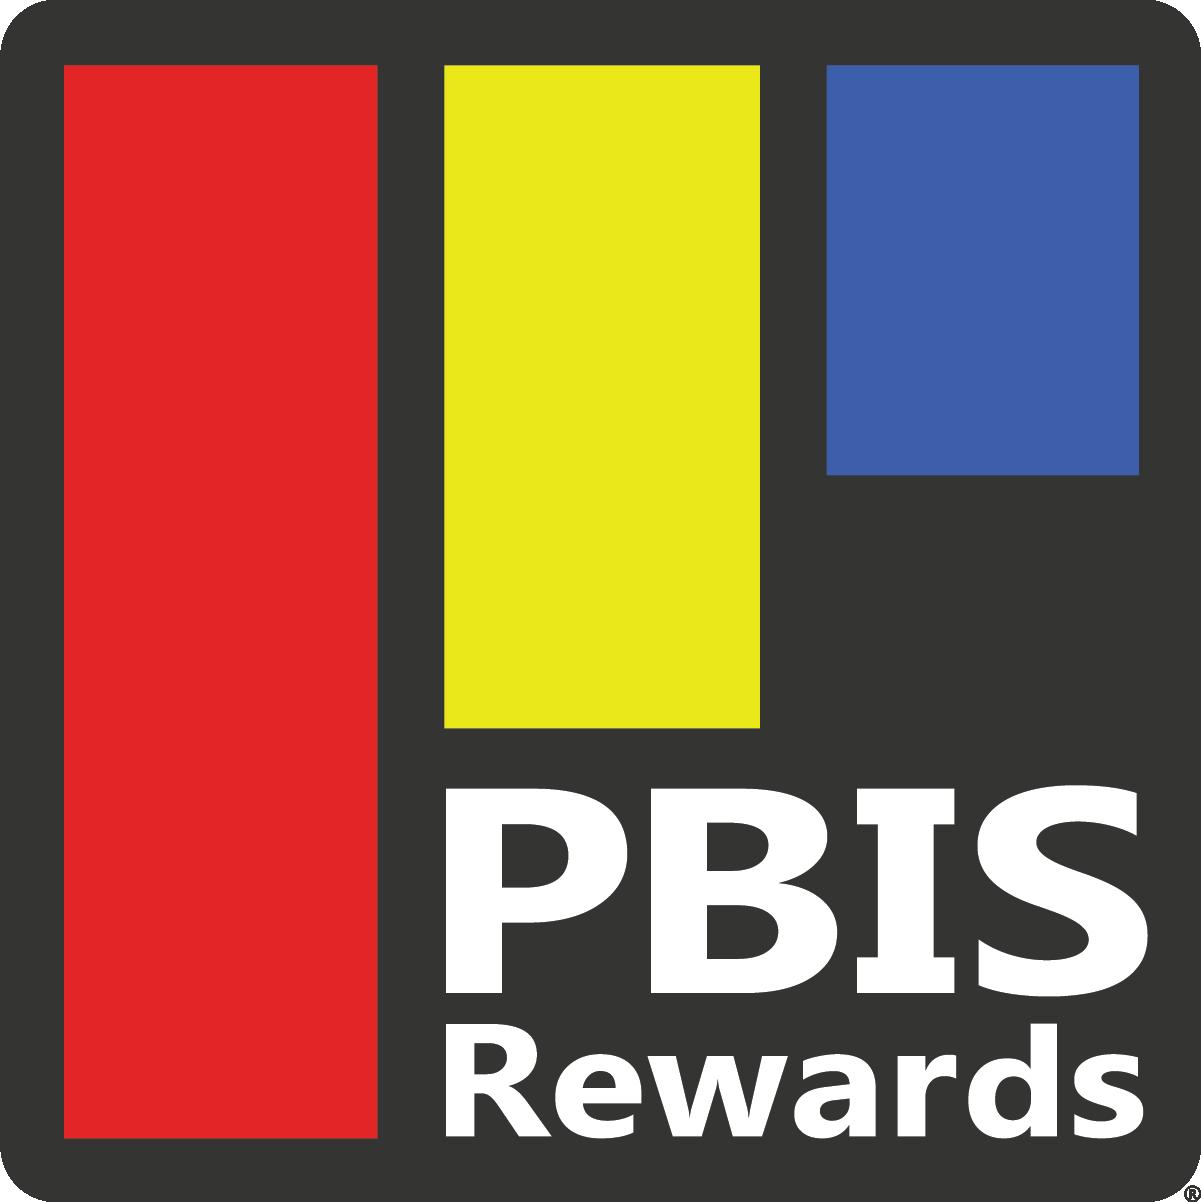 PBIS Rewards Logo, Media Resources & Press Release Template